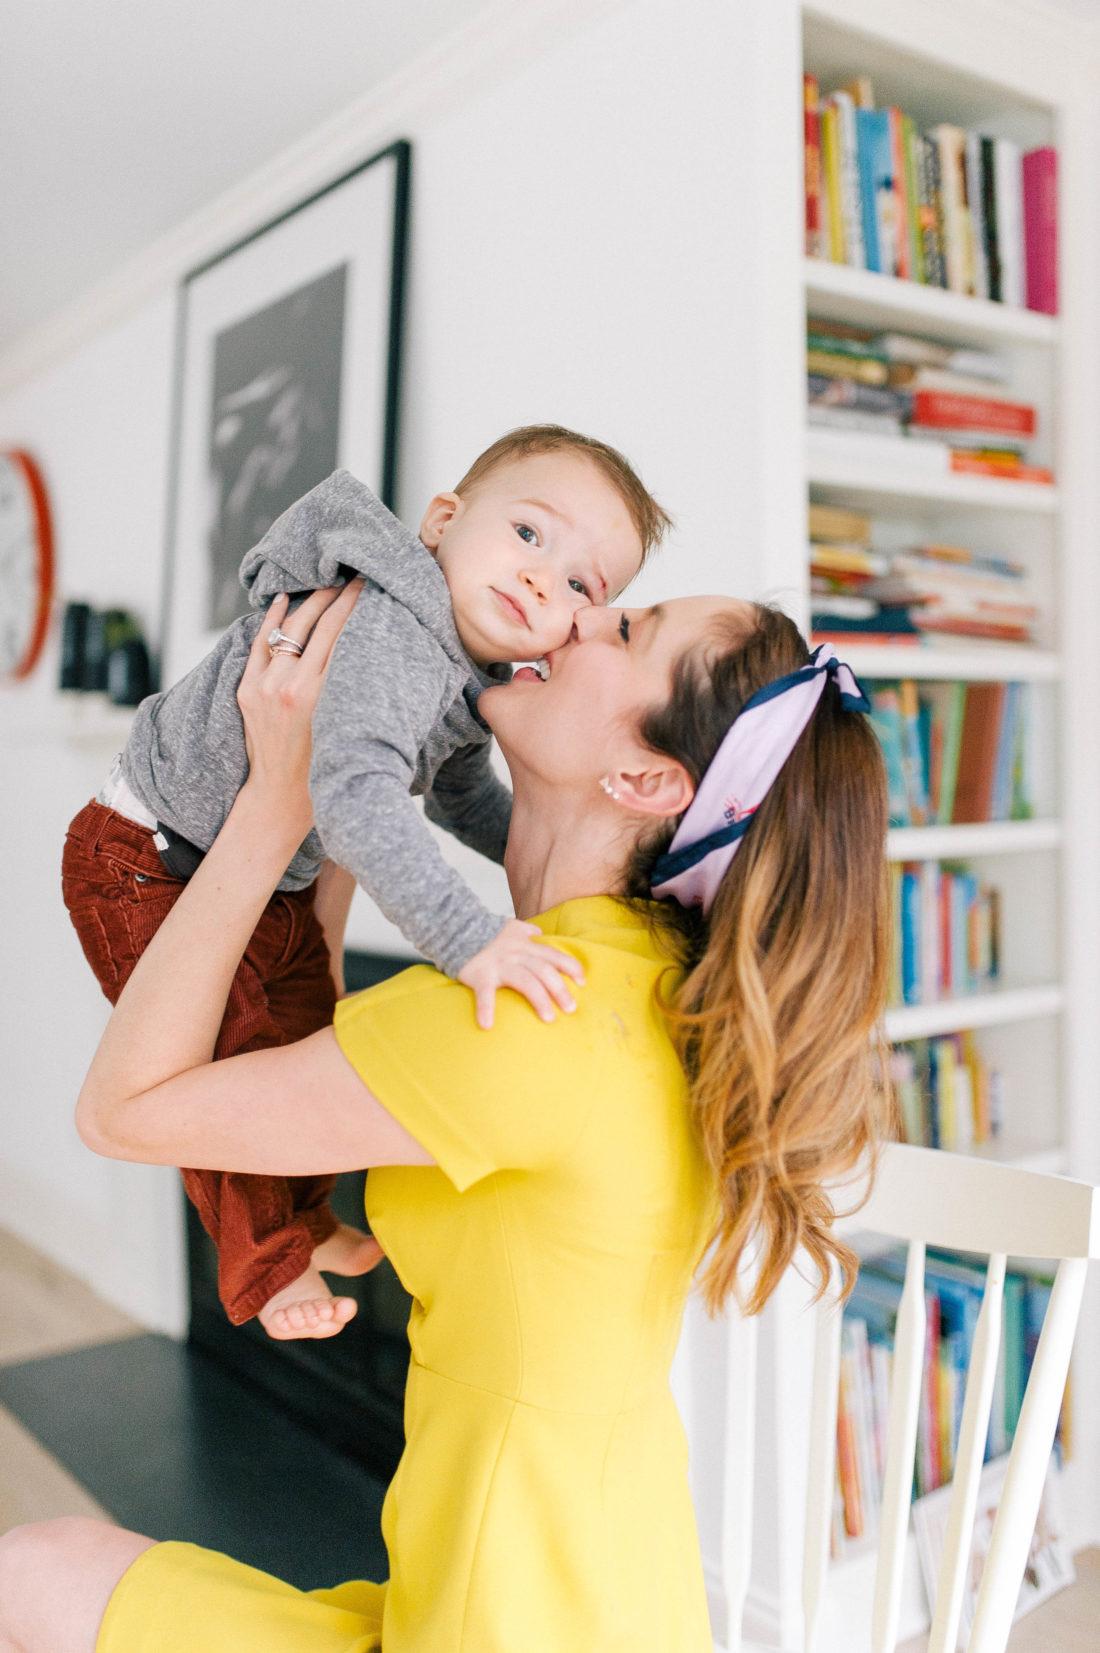 Eva Amurri Martino kisses son Major on his cheek